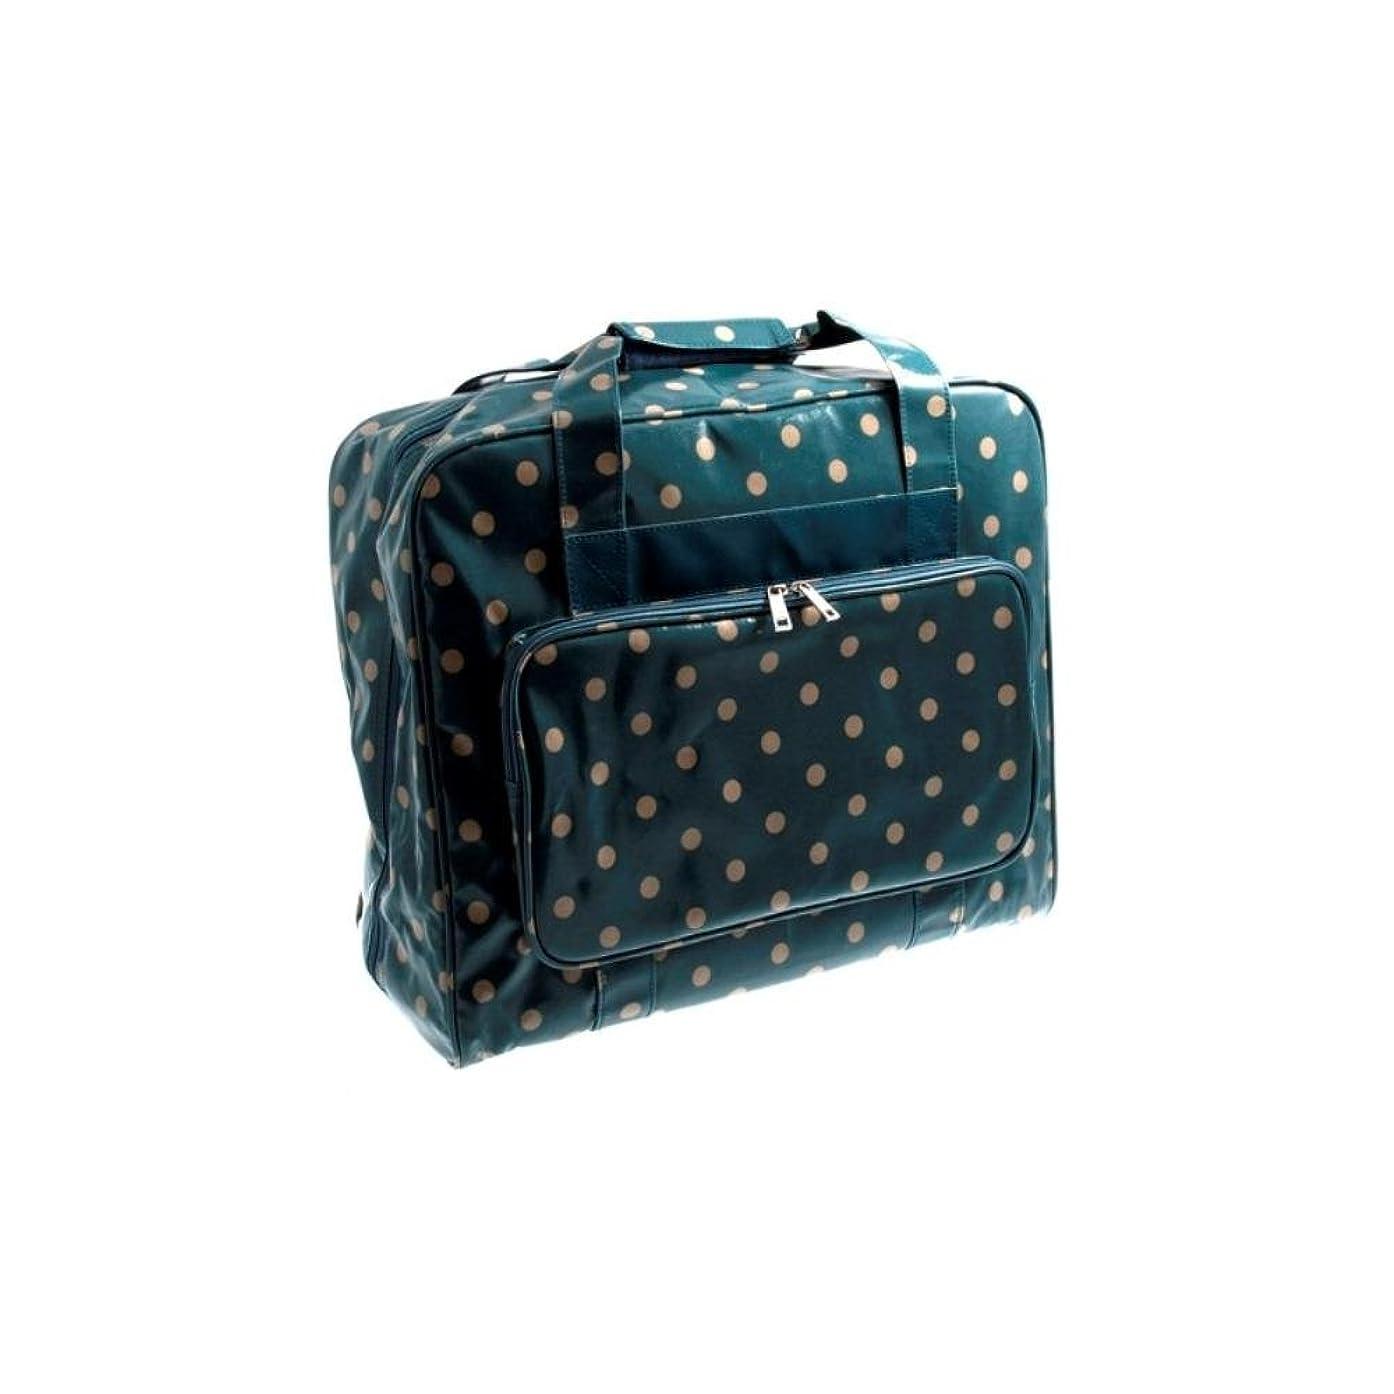 Hobbygift Sewing Machine Bag Vintage Blue Polka Dots Crafts Storage